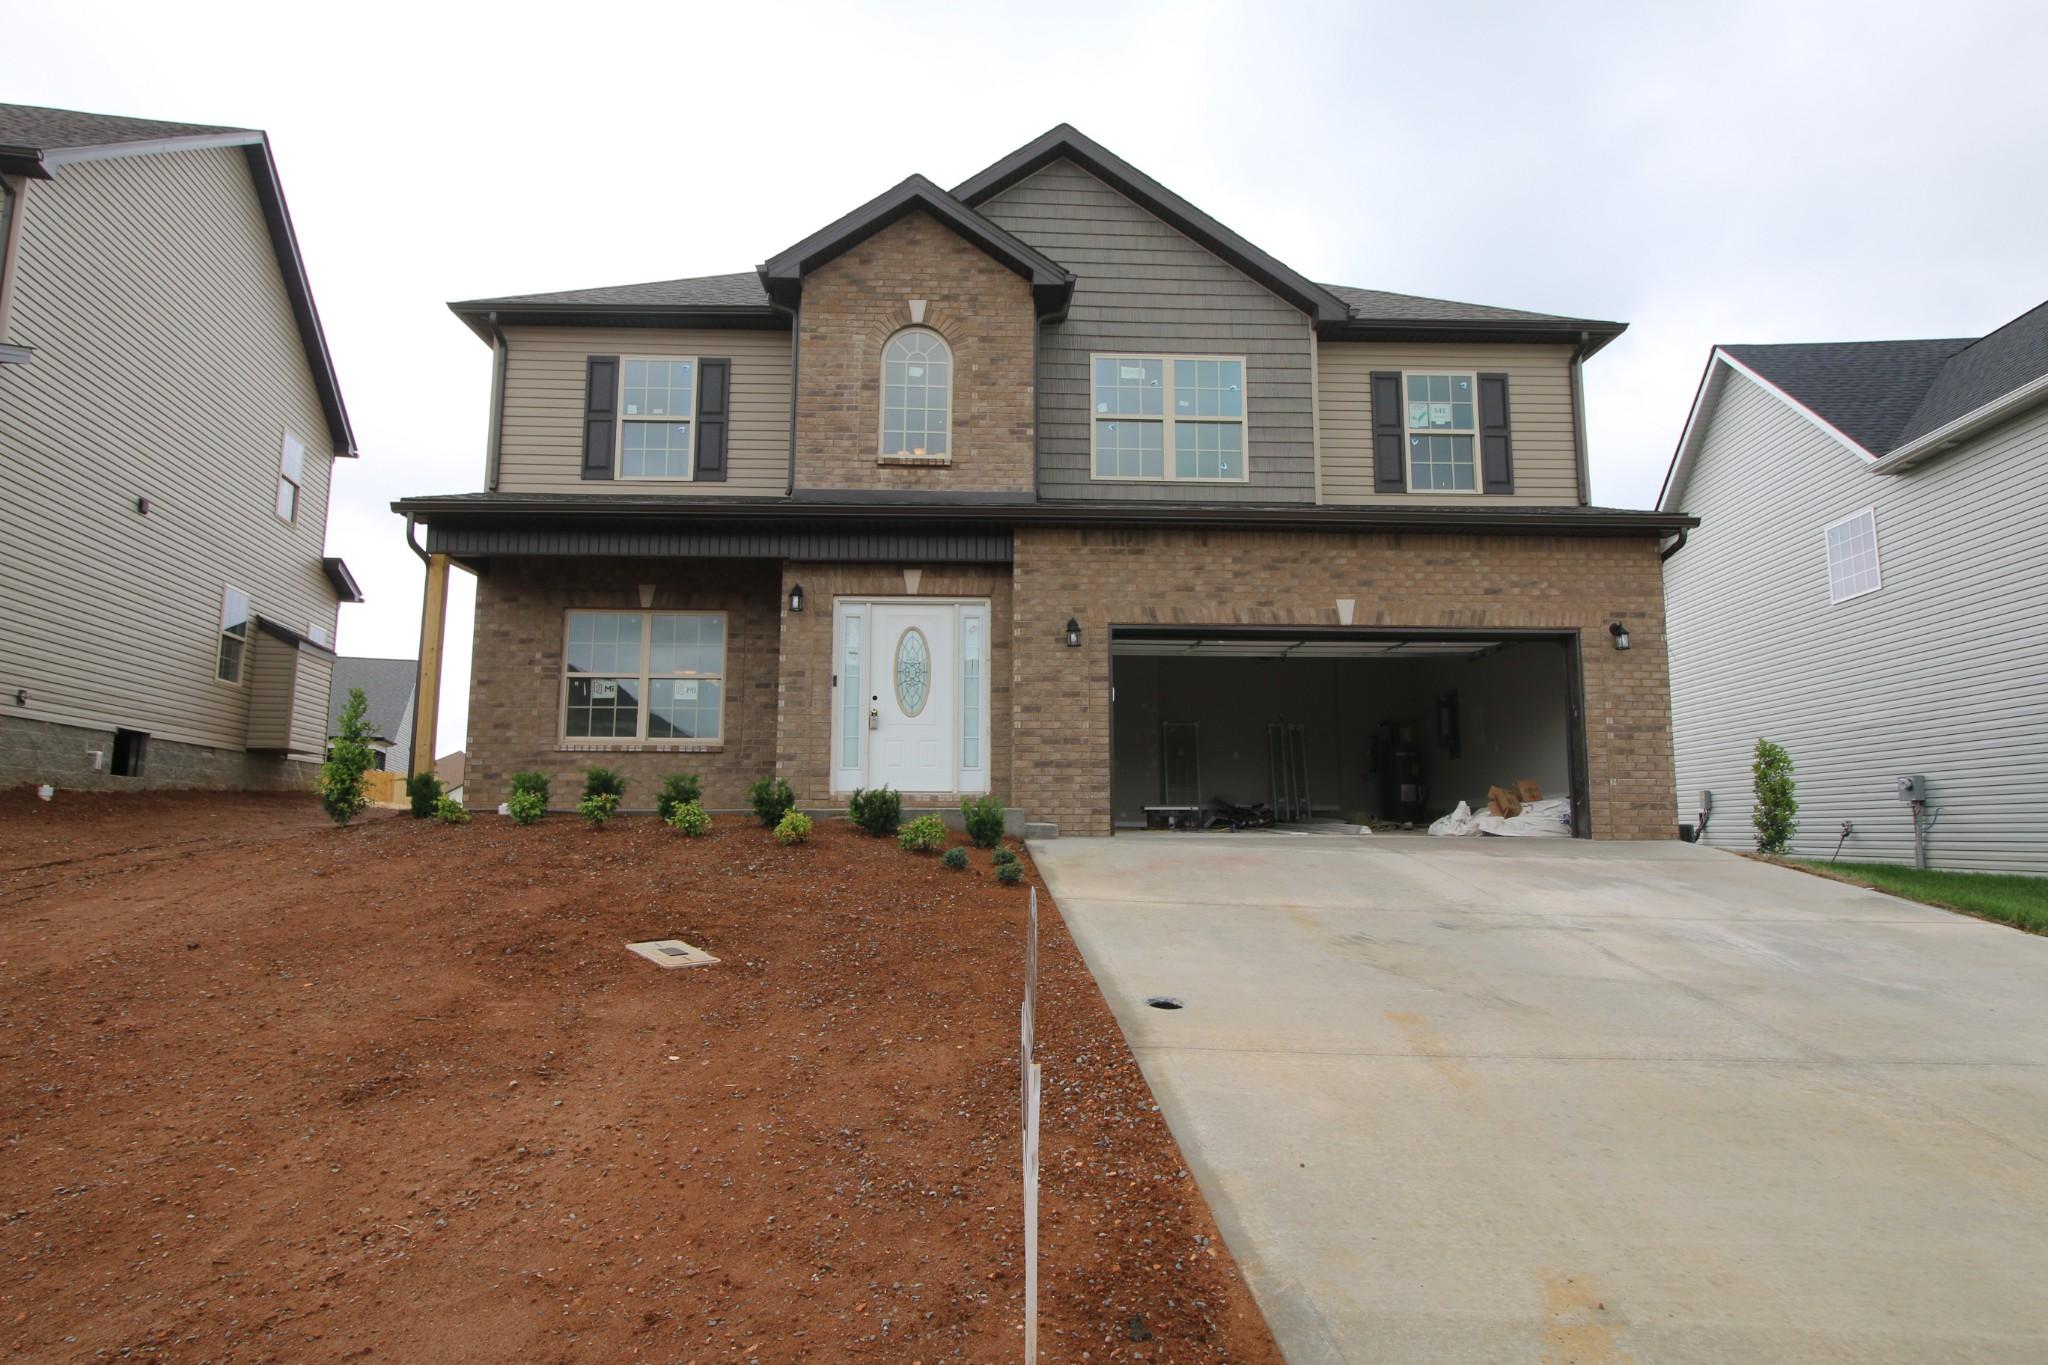 541 Autumn Creek Property Photo - Clarksville, TN real estate listing